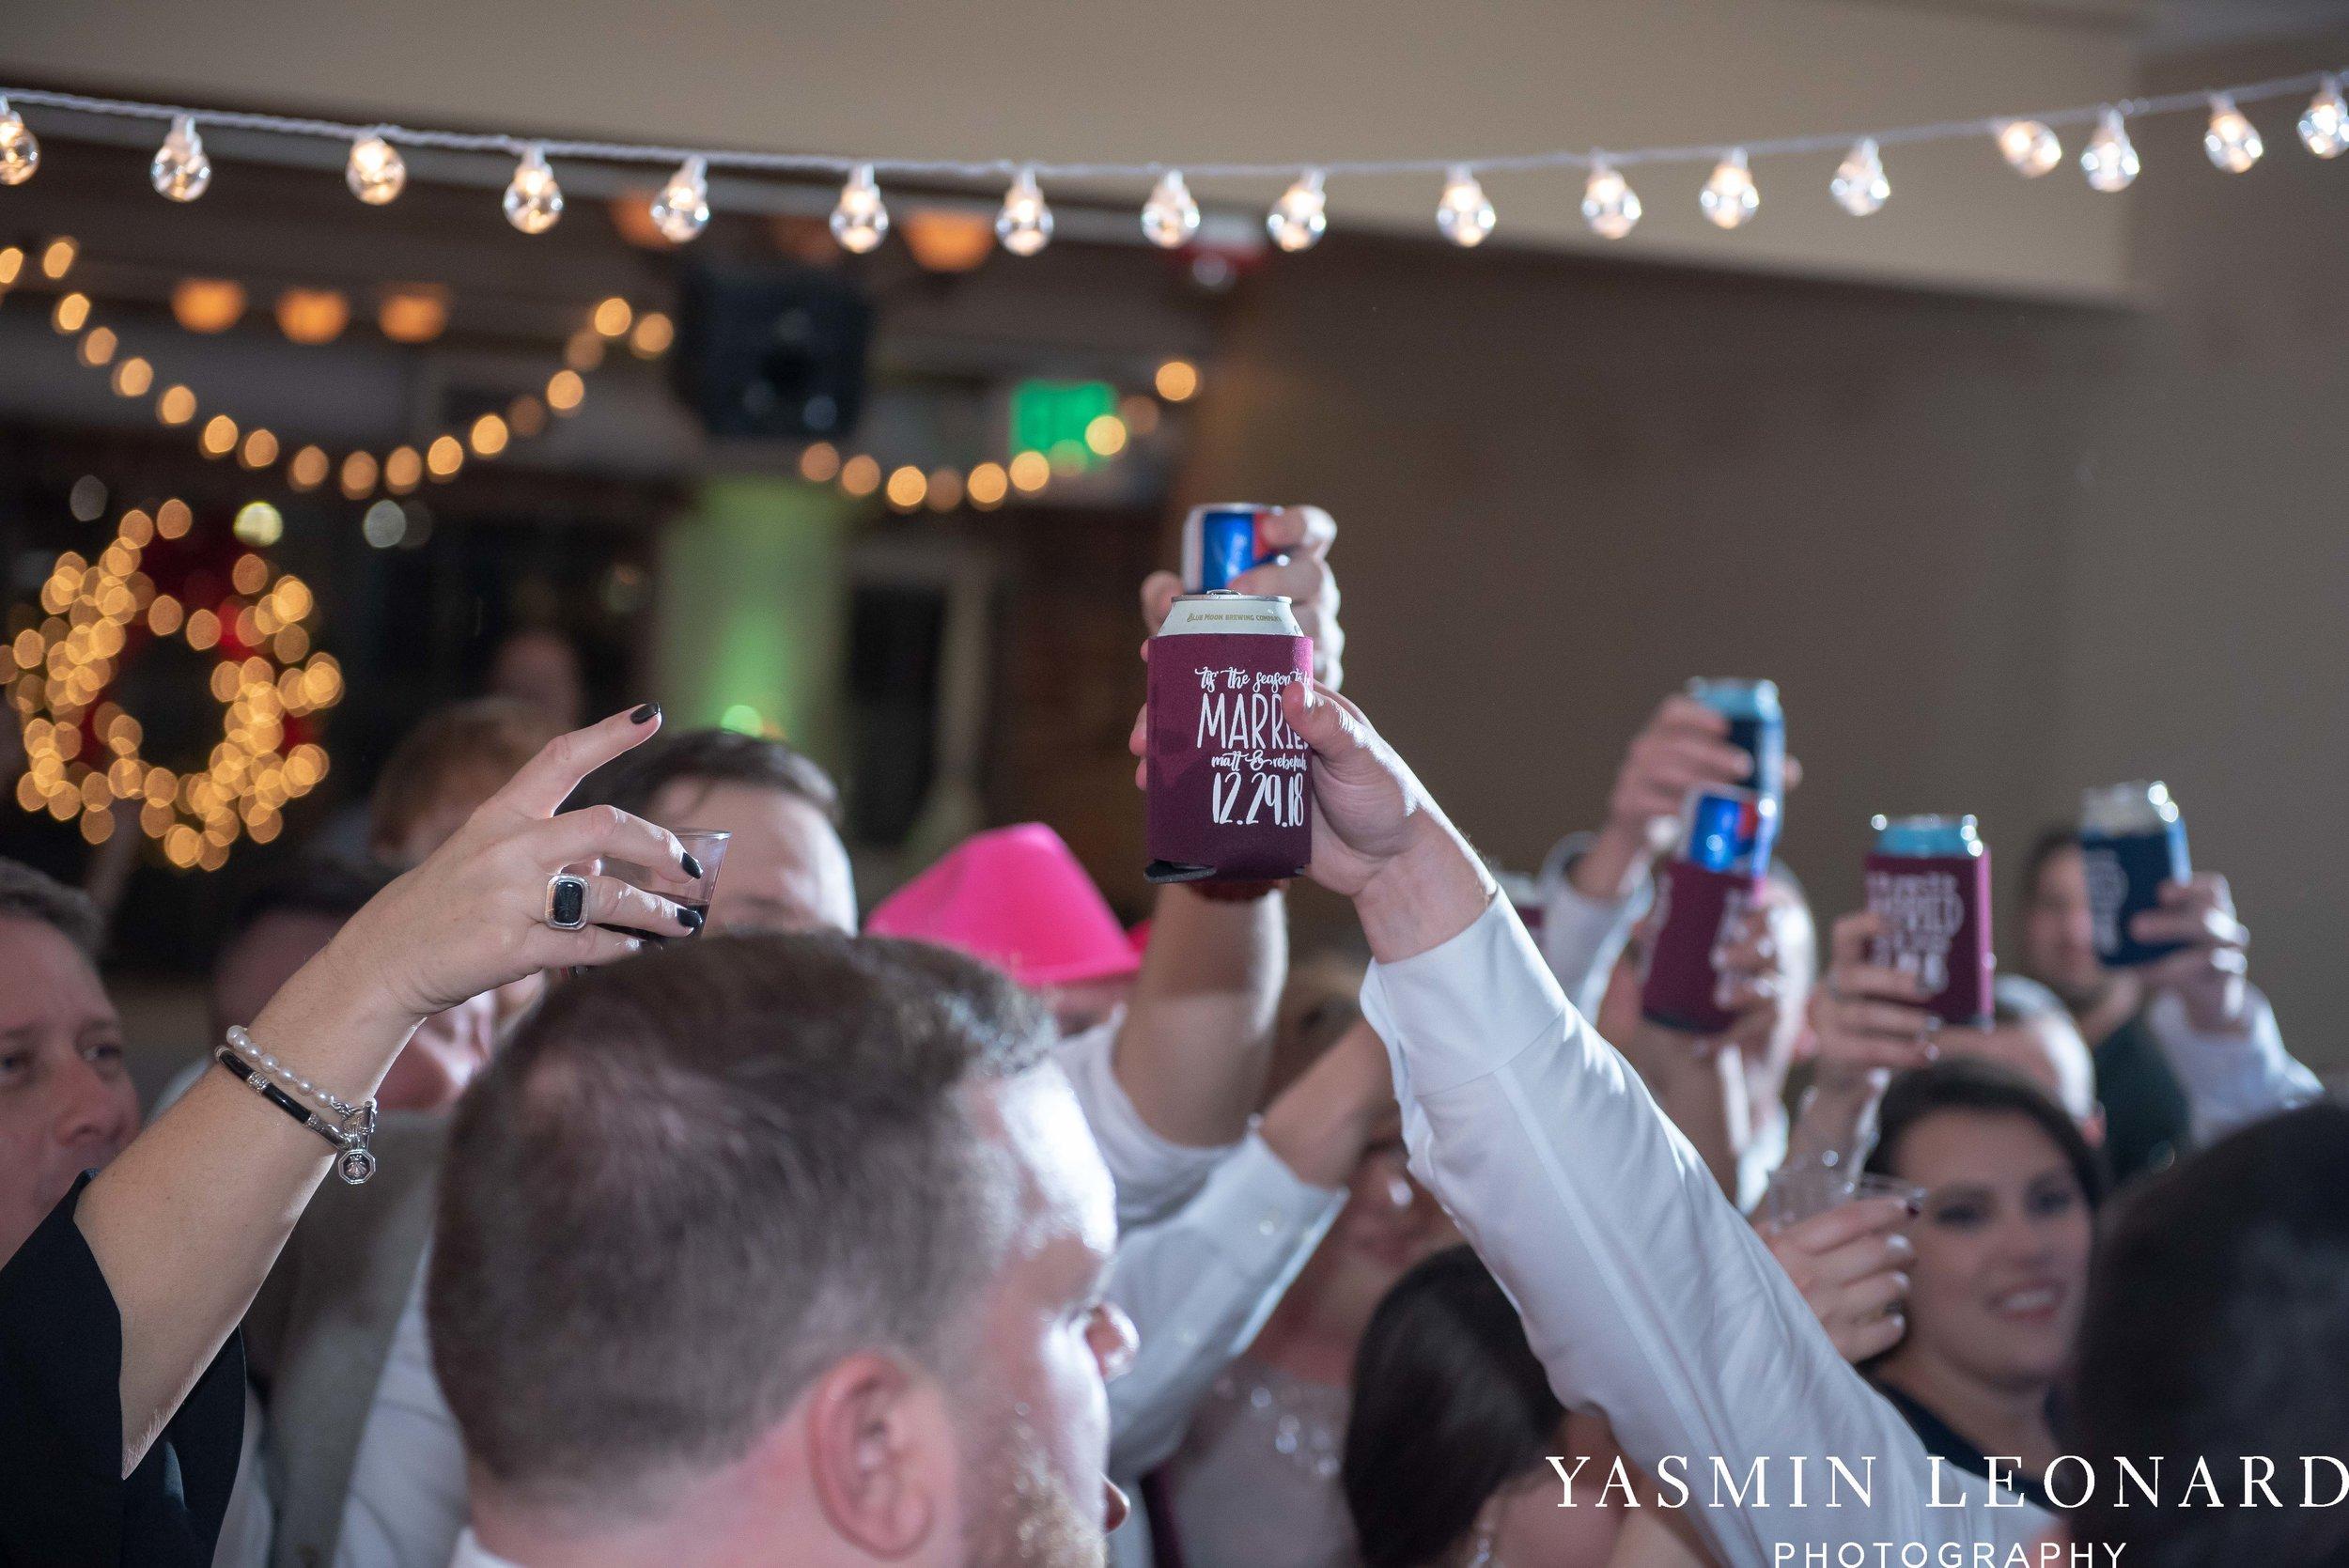 Rebekah and Matt - 105 Worth Event Centre - Yasmin Leonard Photography - Asheboro Wedding - NC Wedding - High Point Weddings - Triad Weddings - Winter Wedding-79.jpg